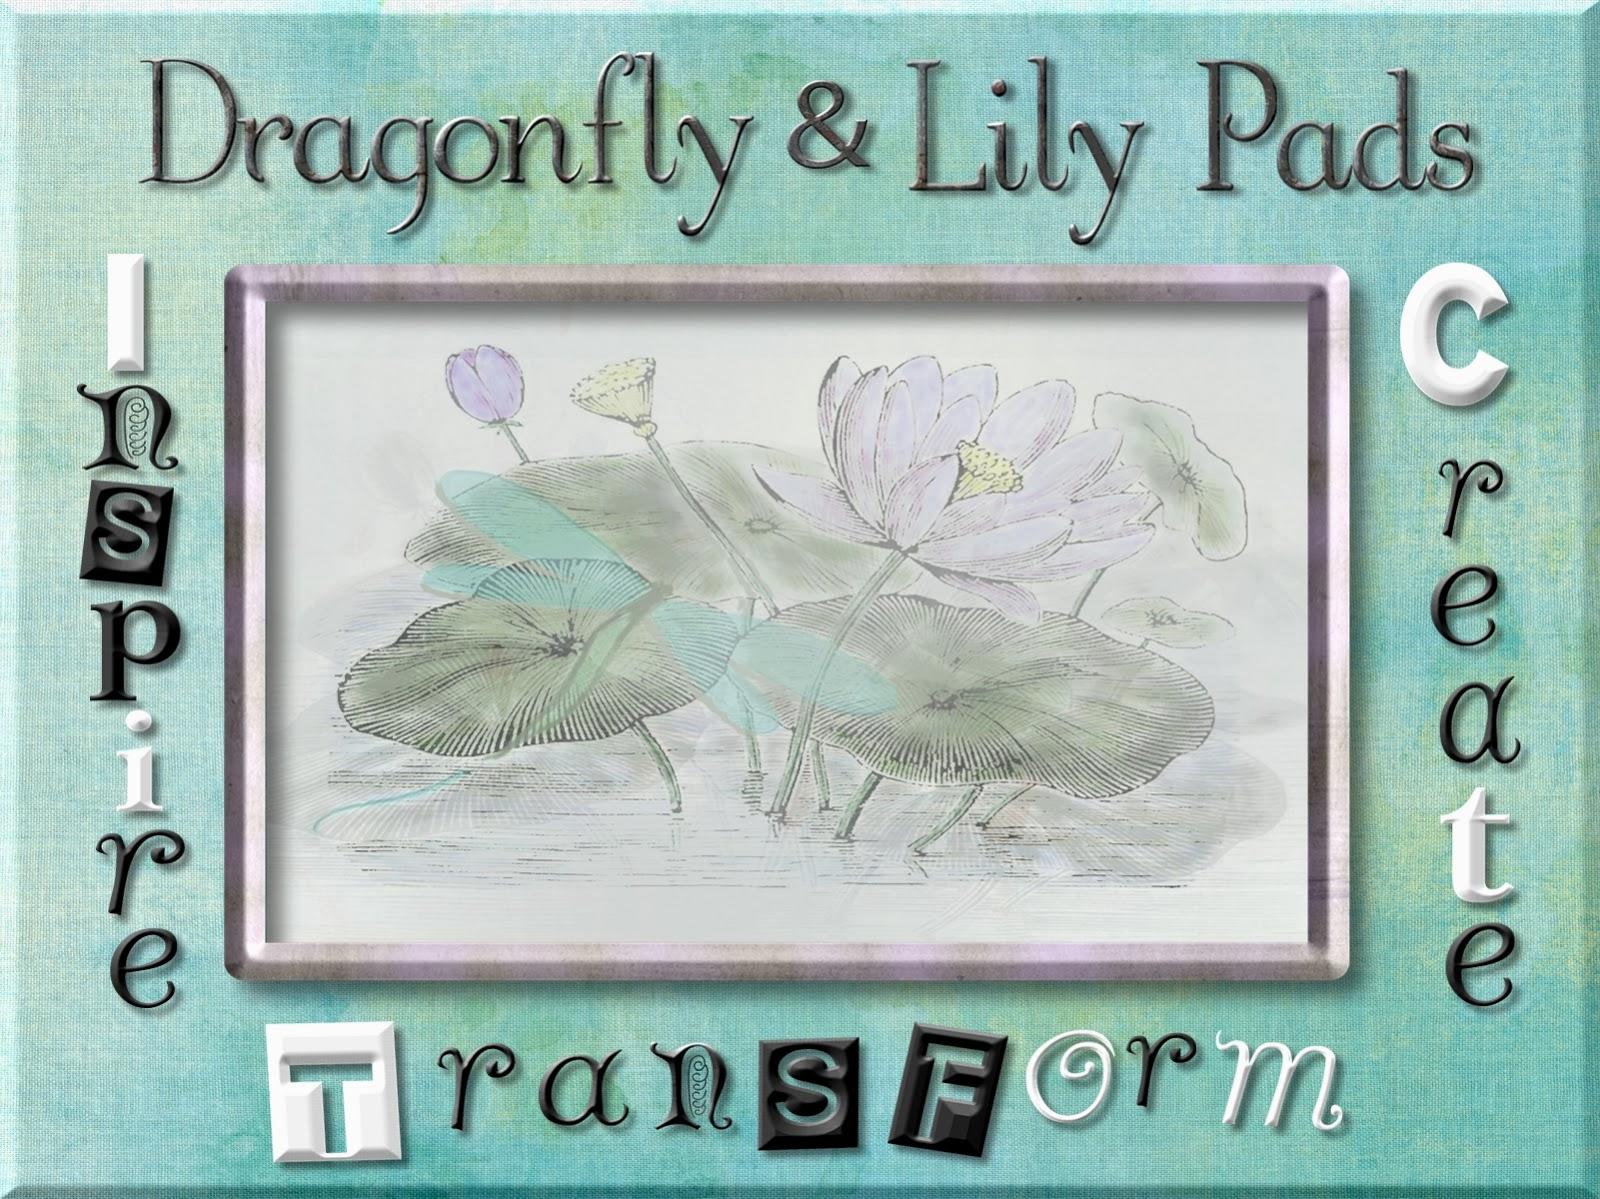 http://dragonflyandlilypads.blogspot.com/